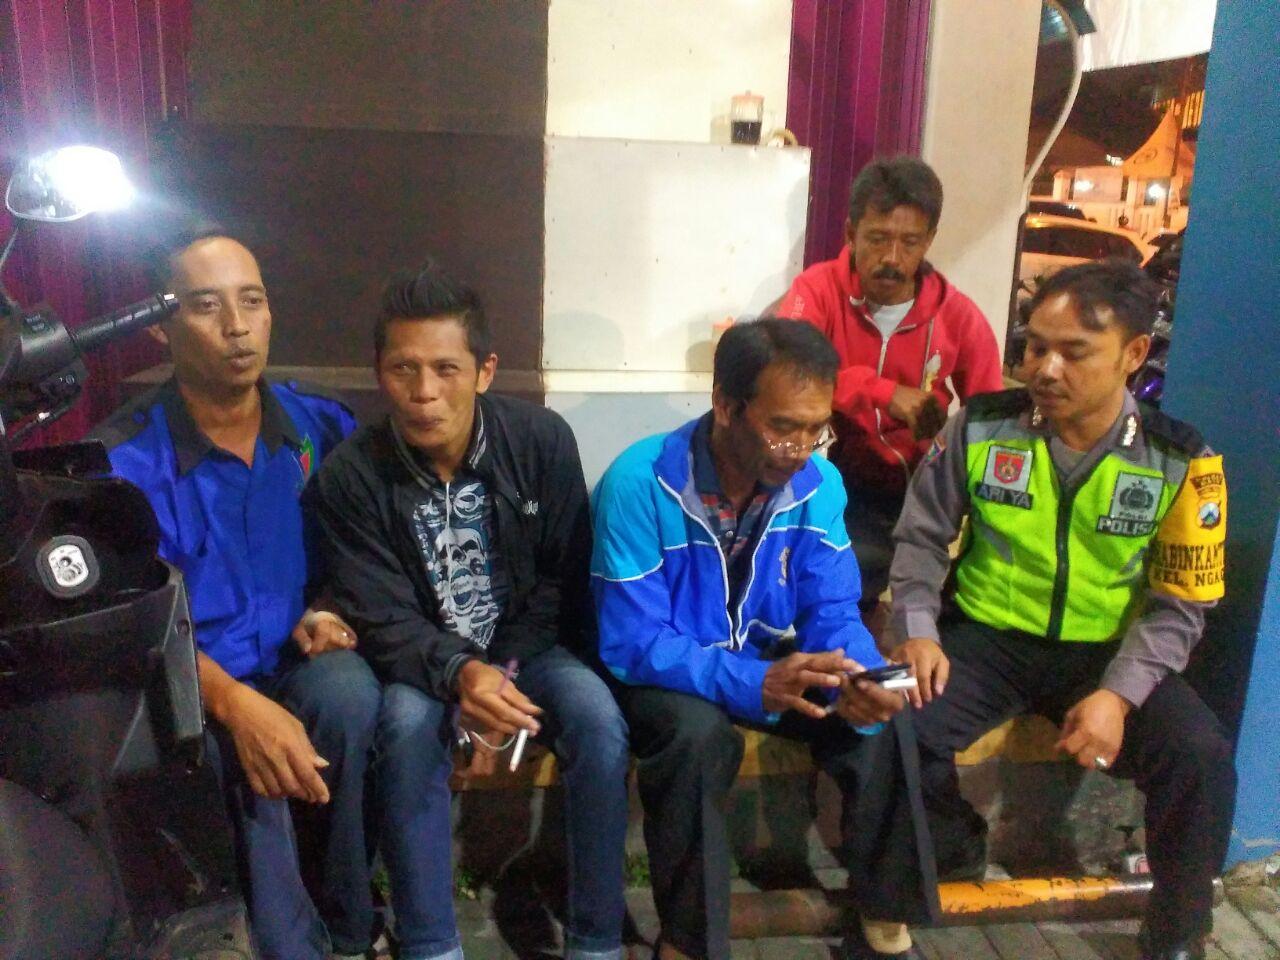 BHABIN SAMBANG DAN BINLUH KE TUKANG PARKIR BTC